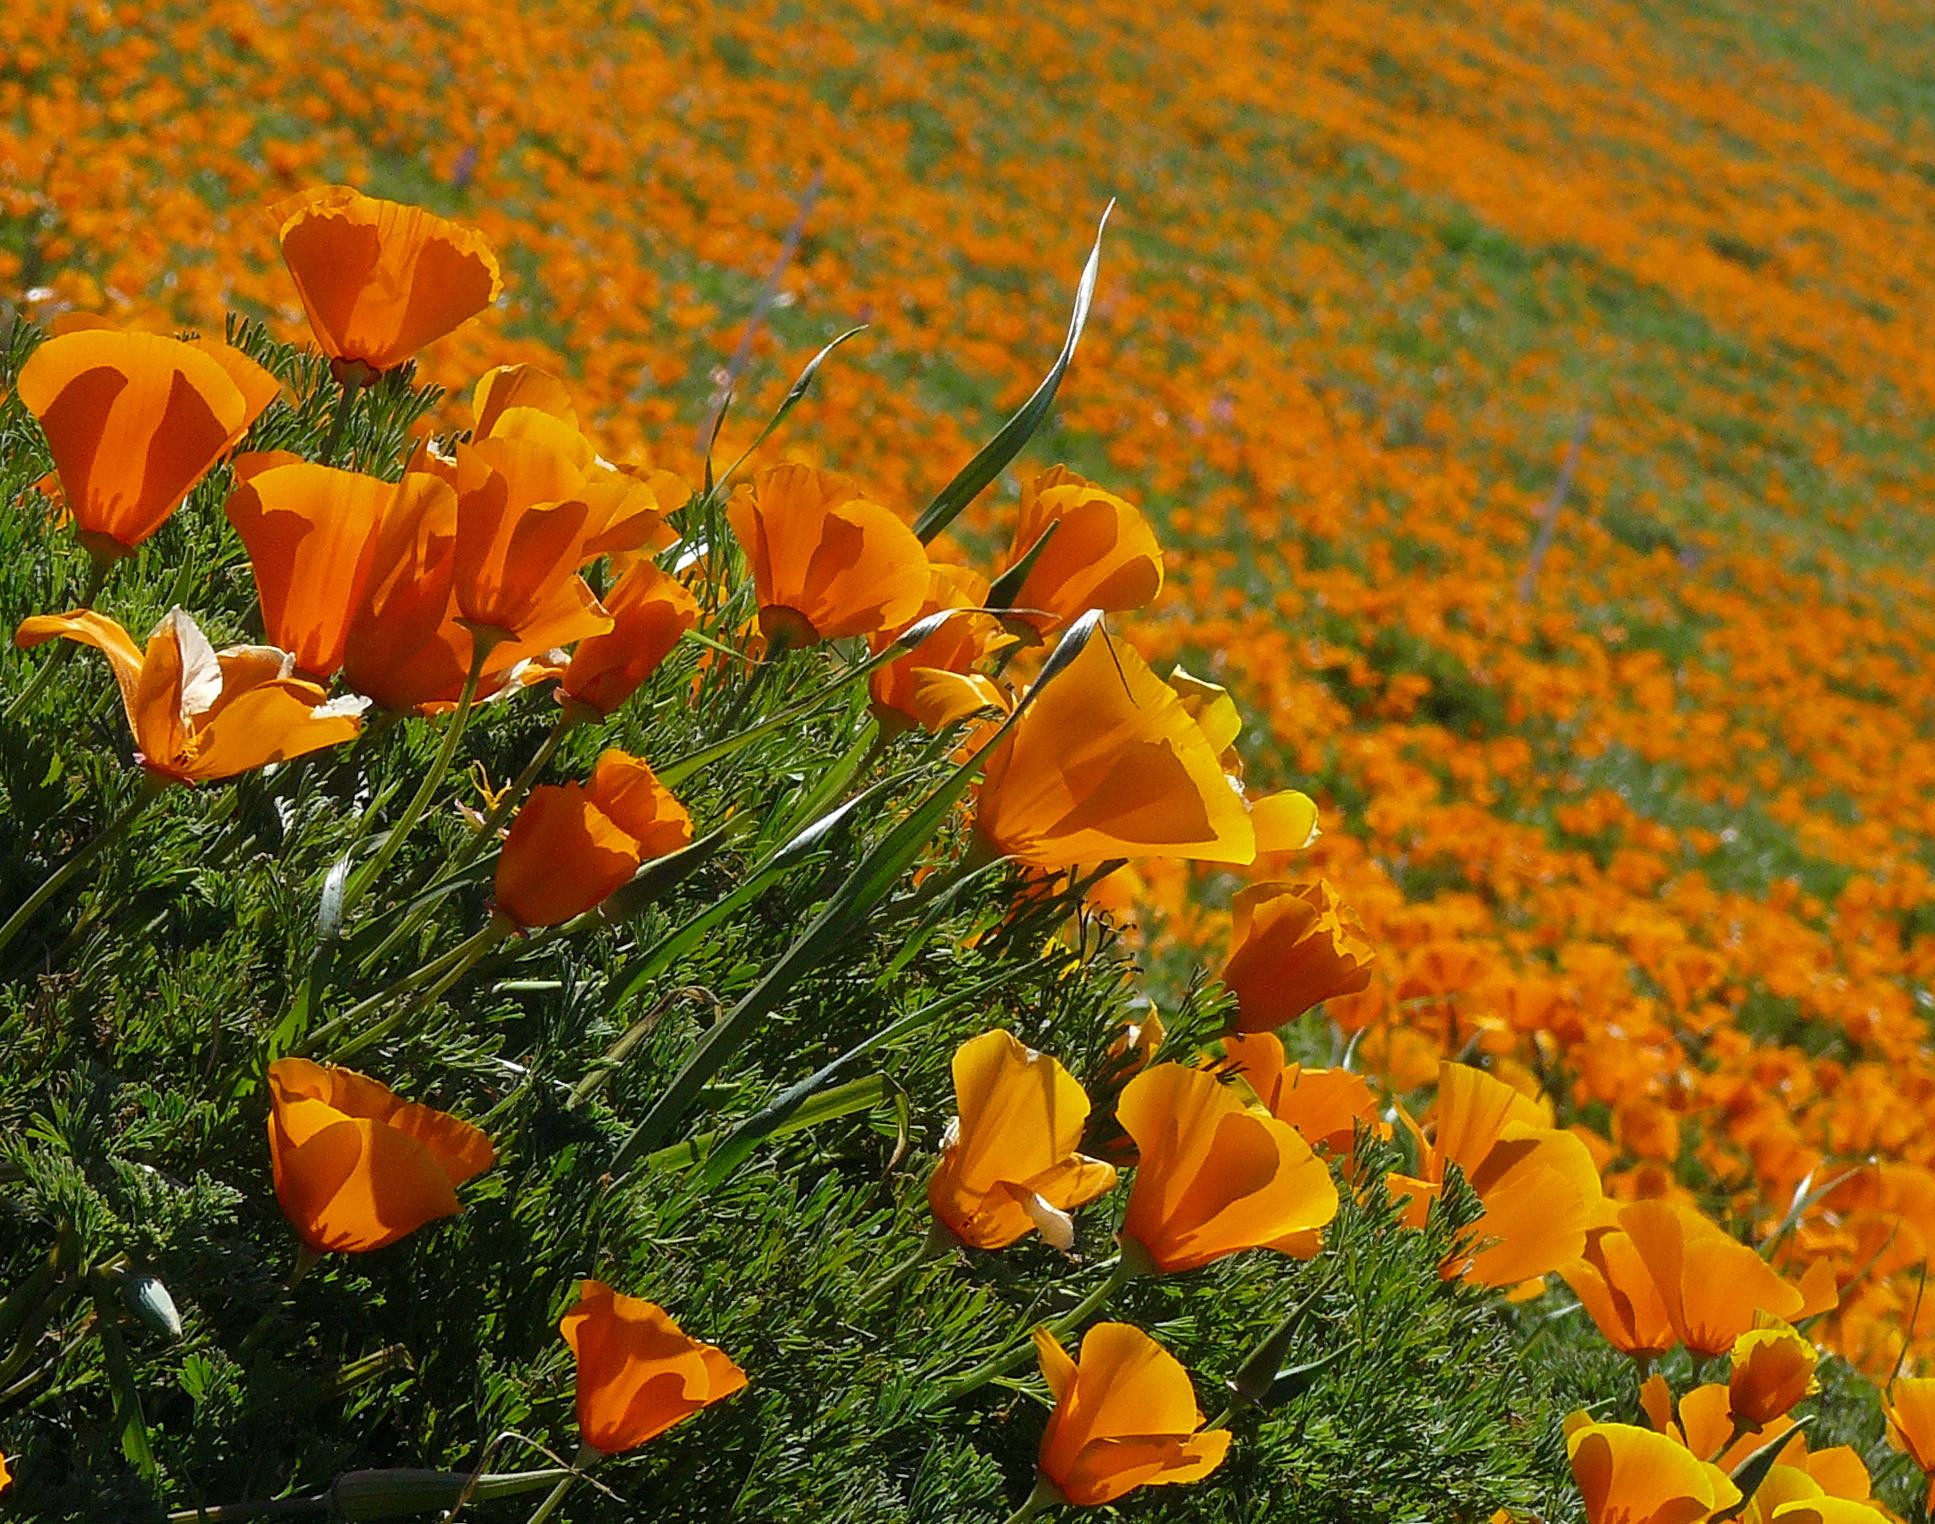 Succulents and more california poppy dreamin for Plante orange